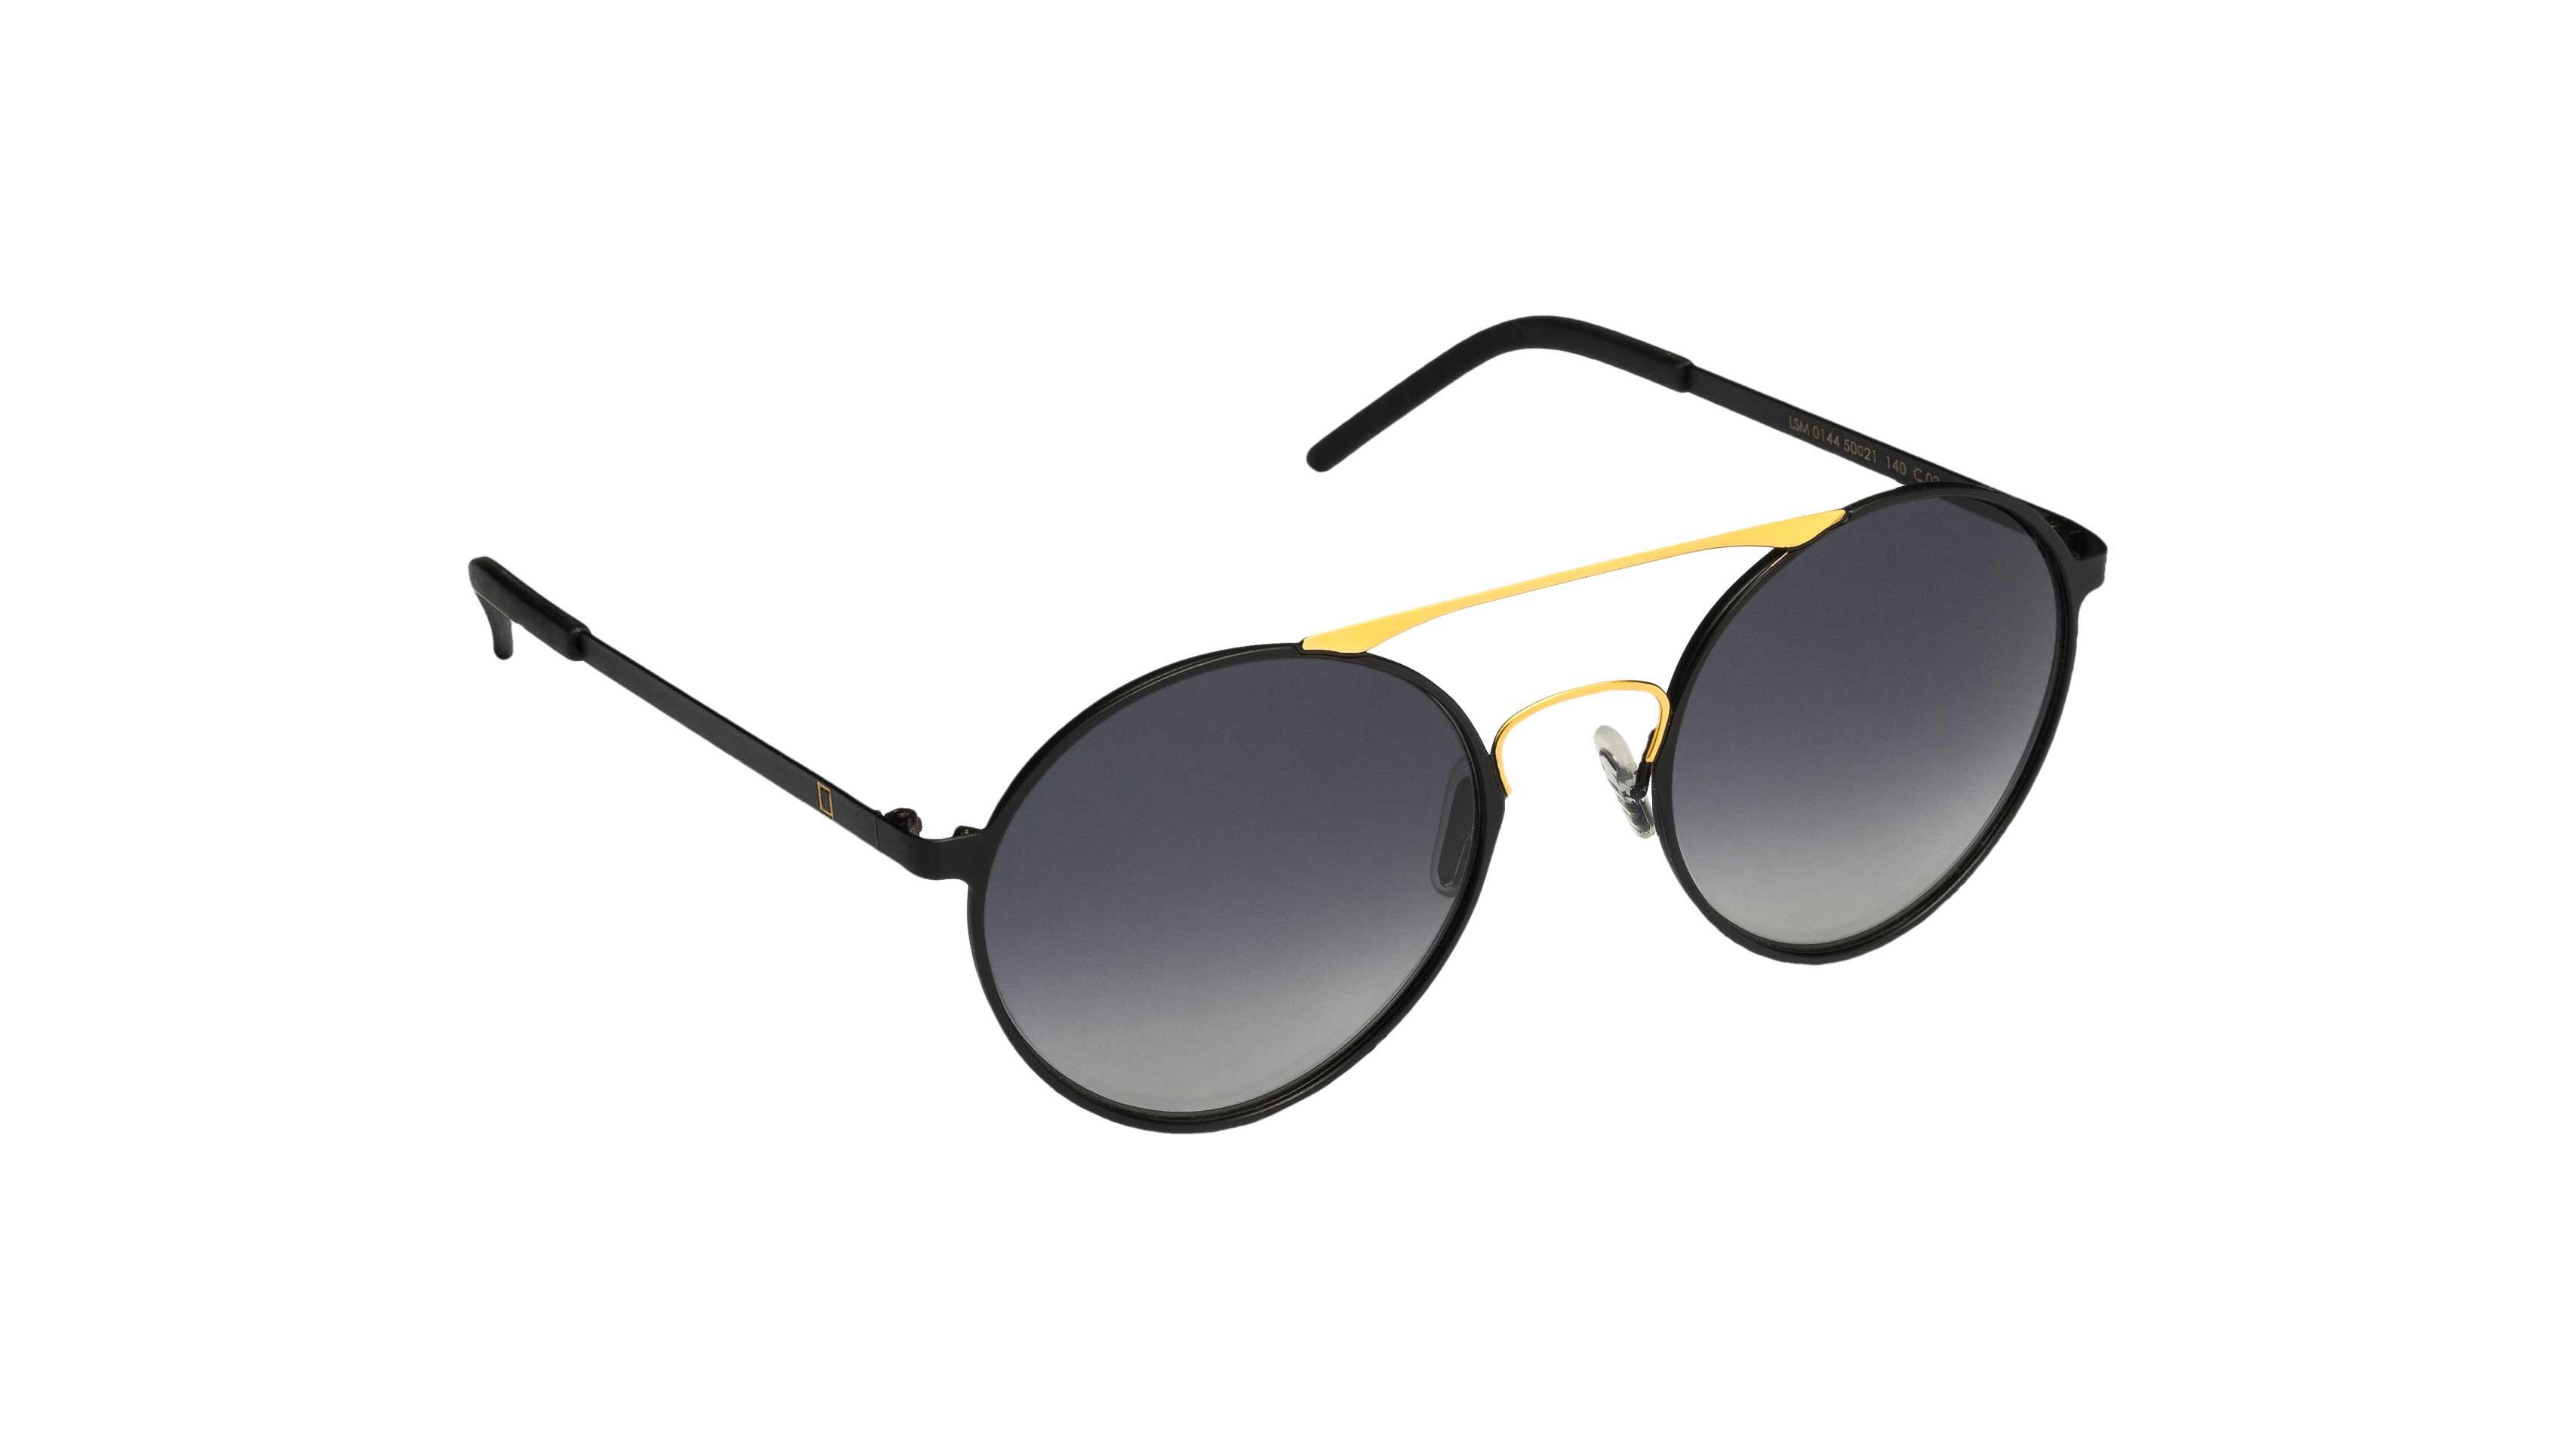 Mediterraneo sunglasses black temple and gold black lens